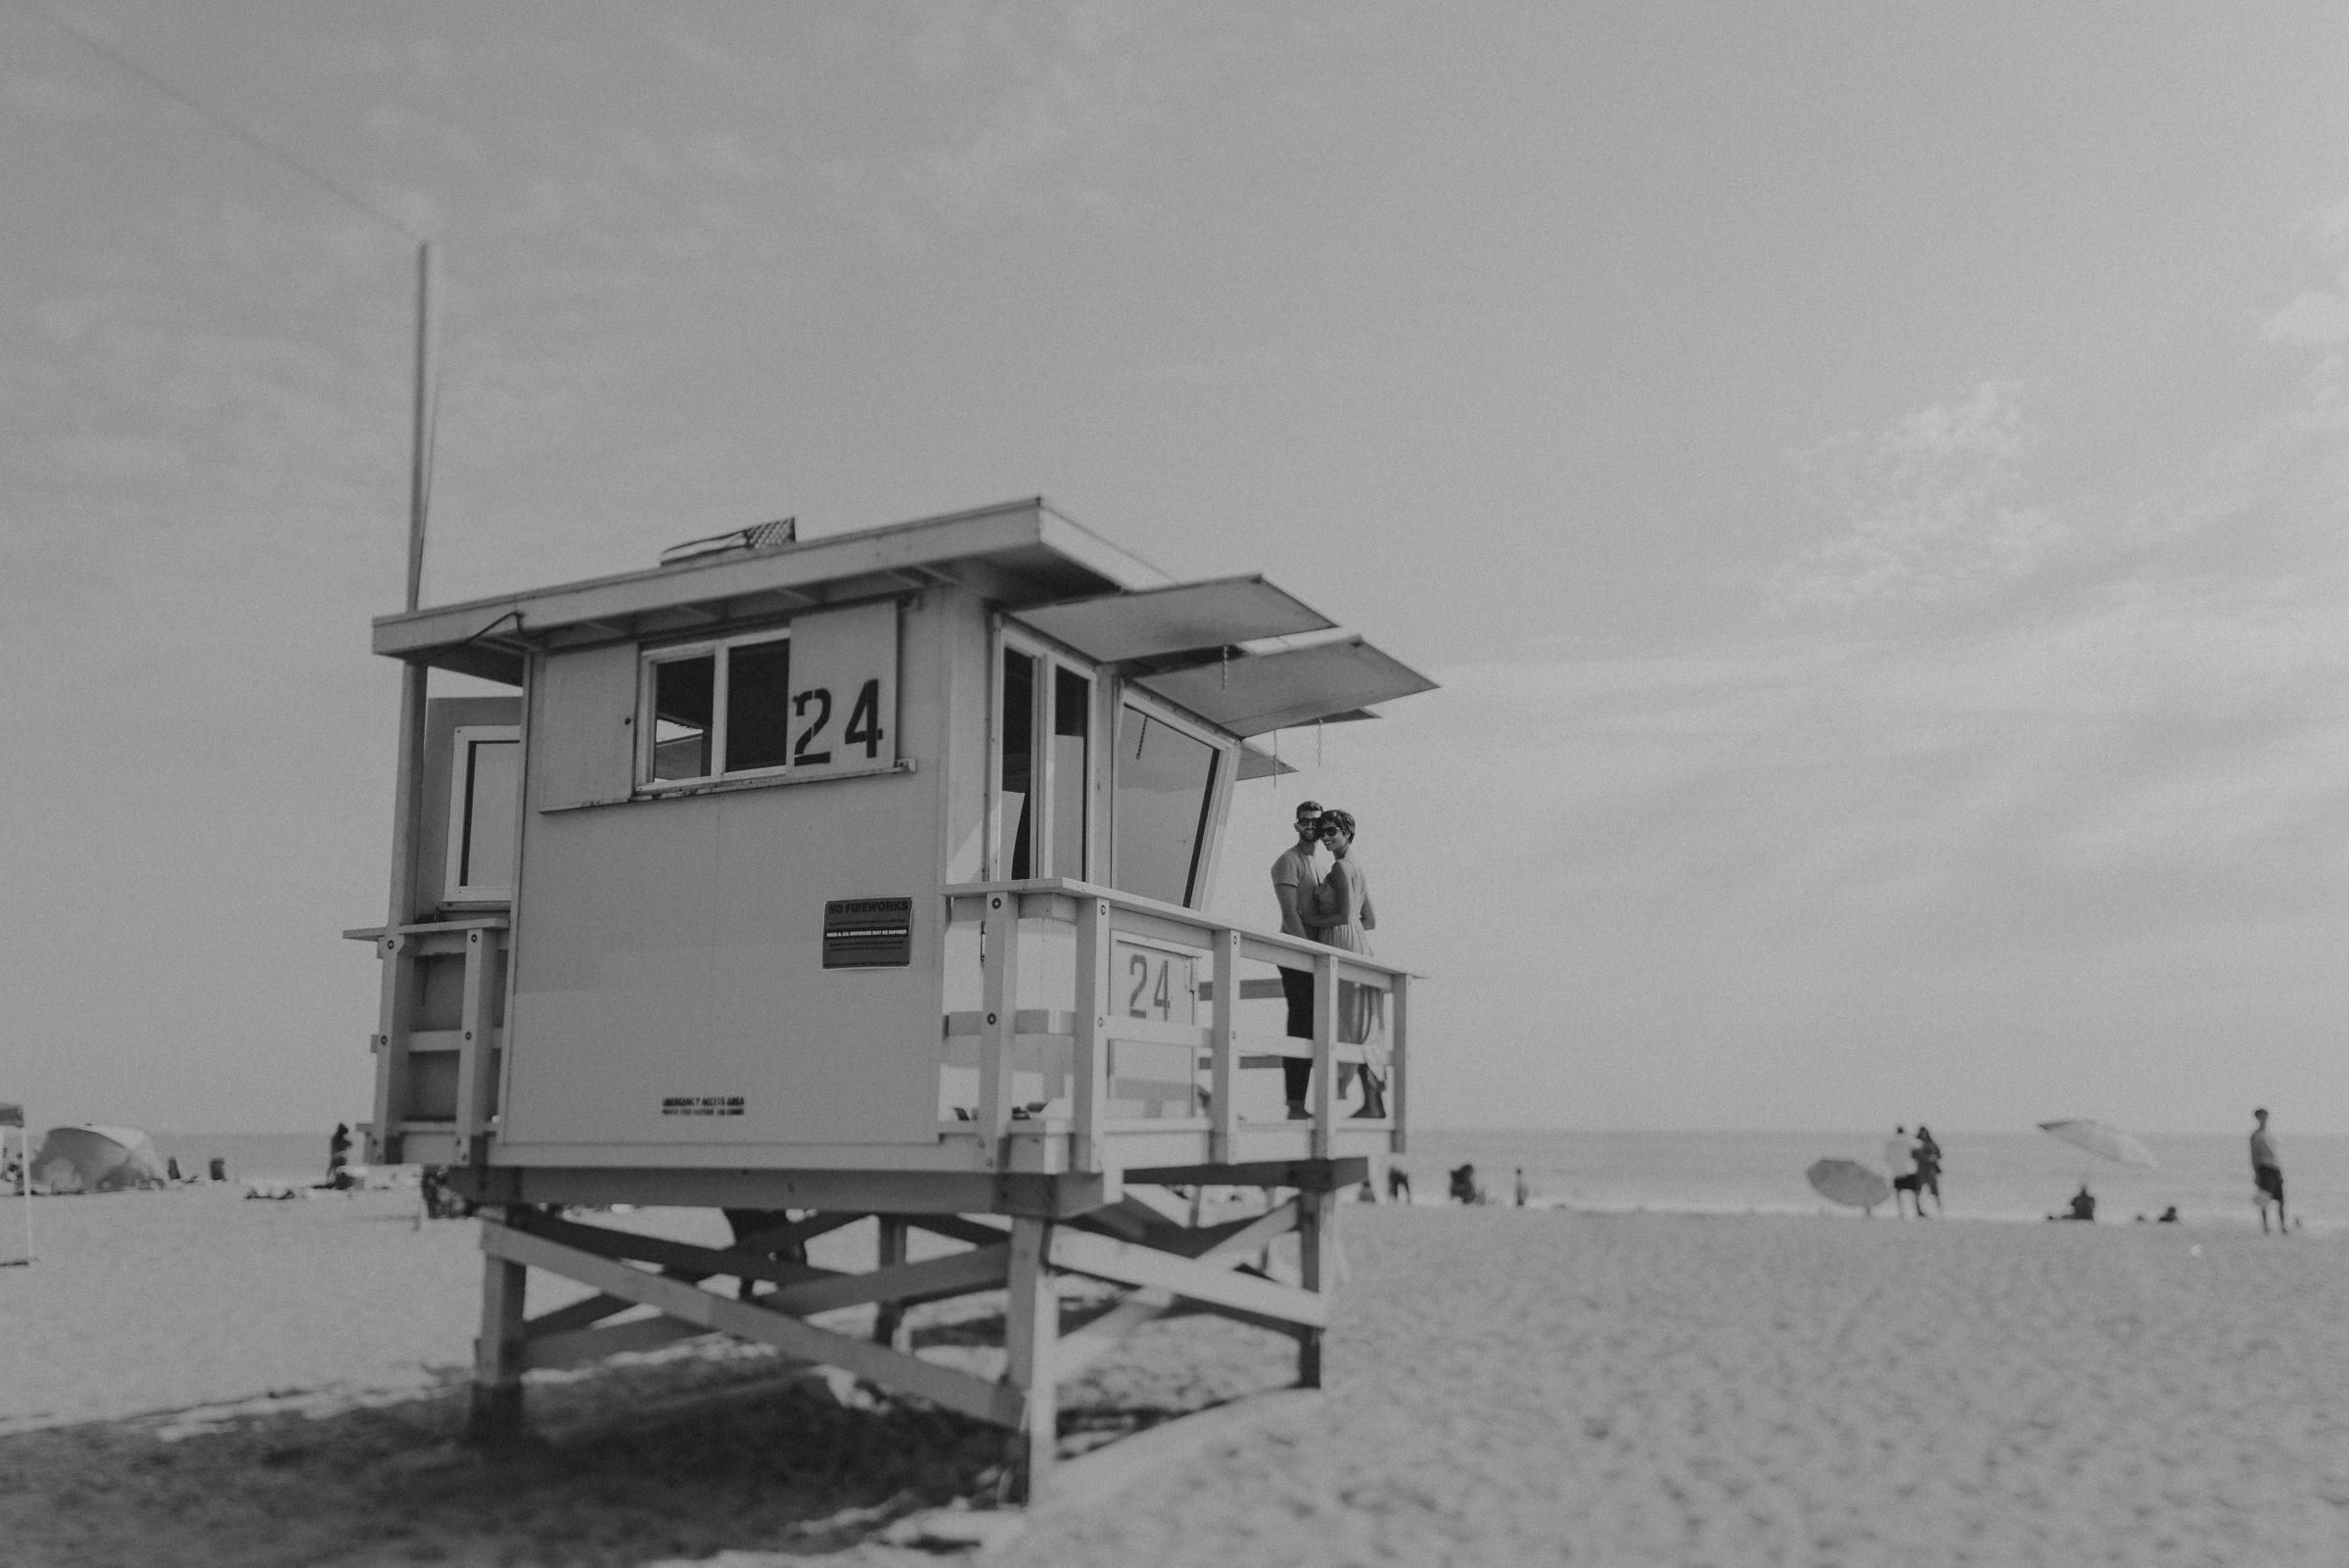 Isaiah + Taylor Photography - Venice Beach & Santa Monica Engagement Session, Los Angeles Wedding Photographer-065.jpg